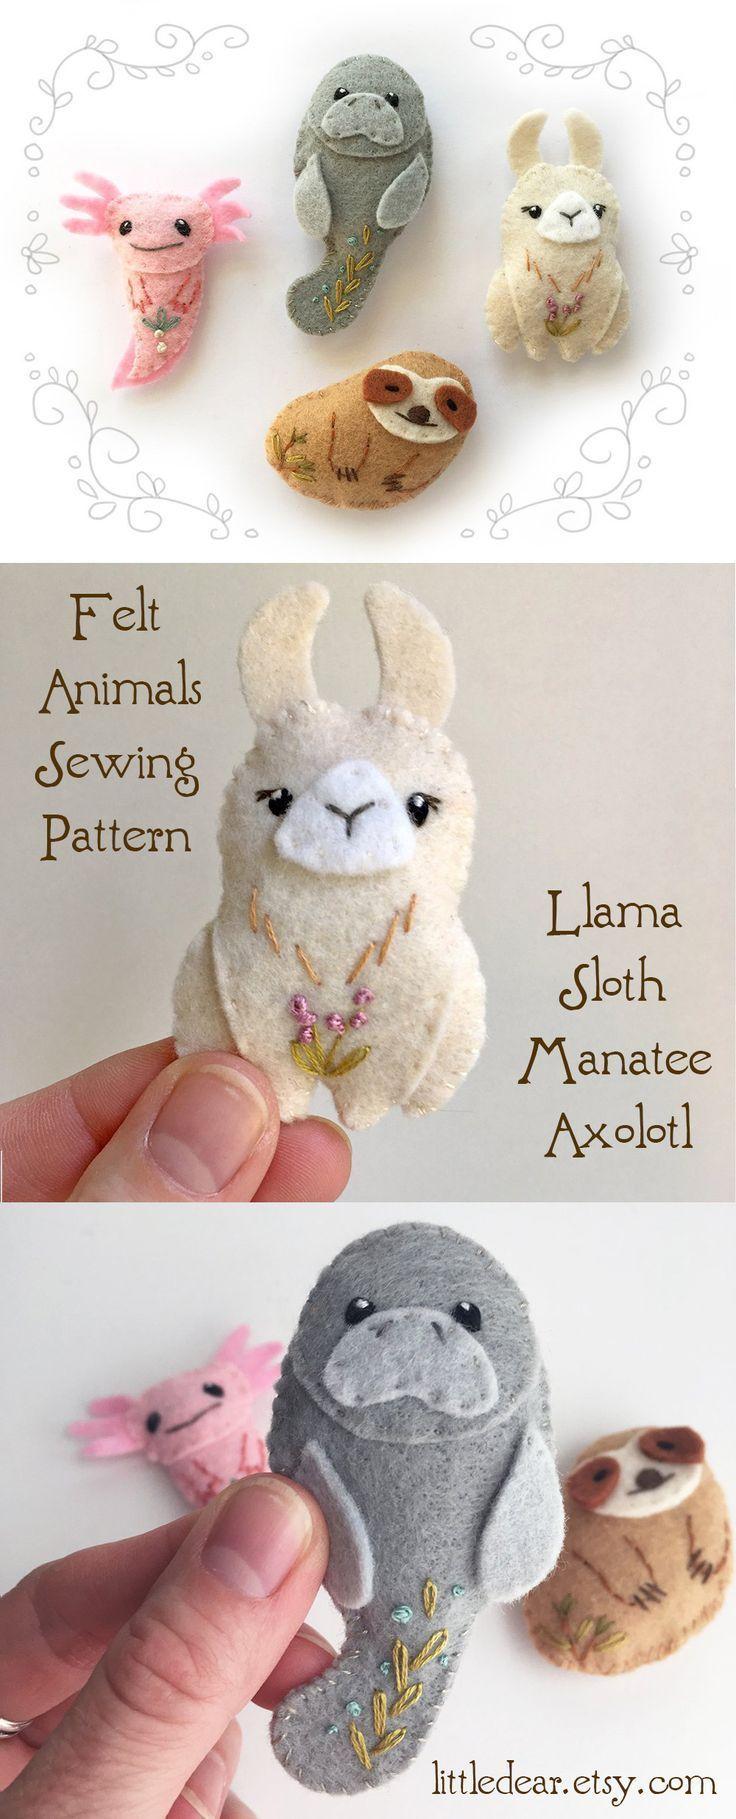 Felt Animals PDF Pattern for Unusual Creatures, Digital Download, Llama, Axolotl, Sloth, Manatee, SVG file